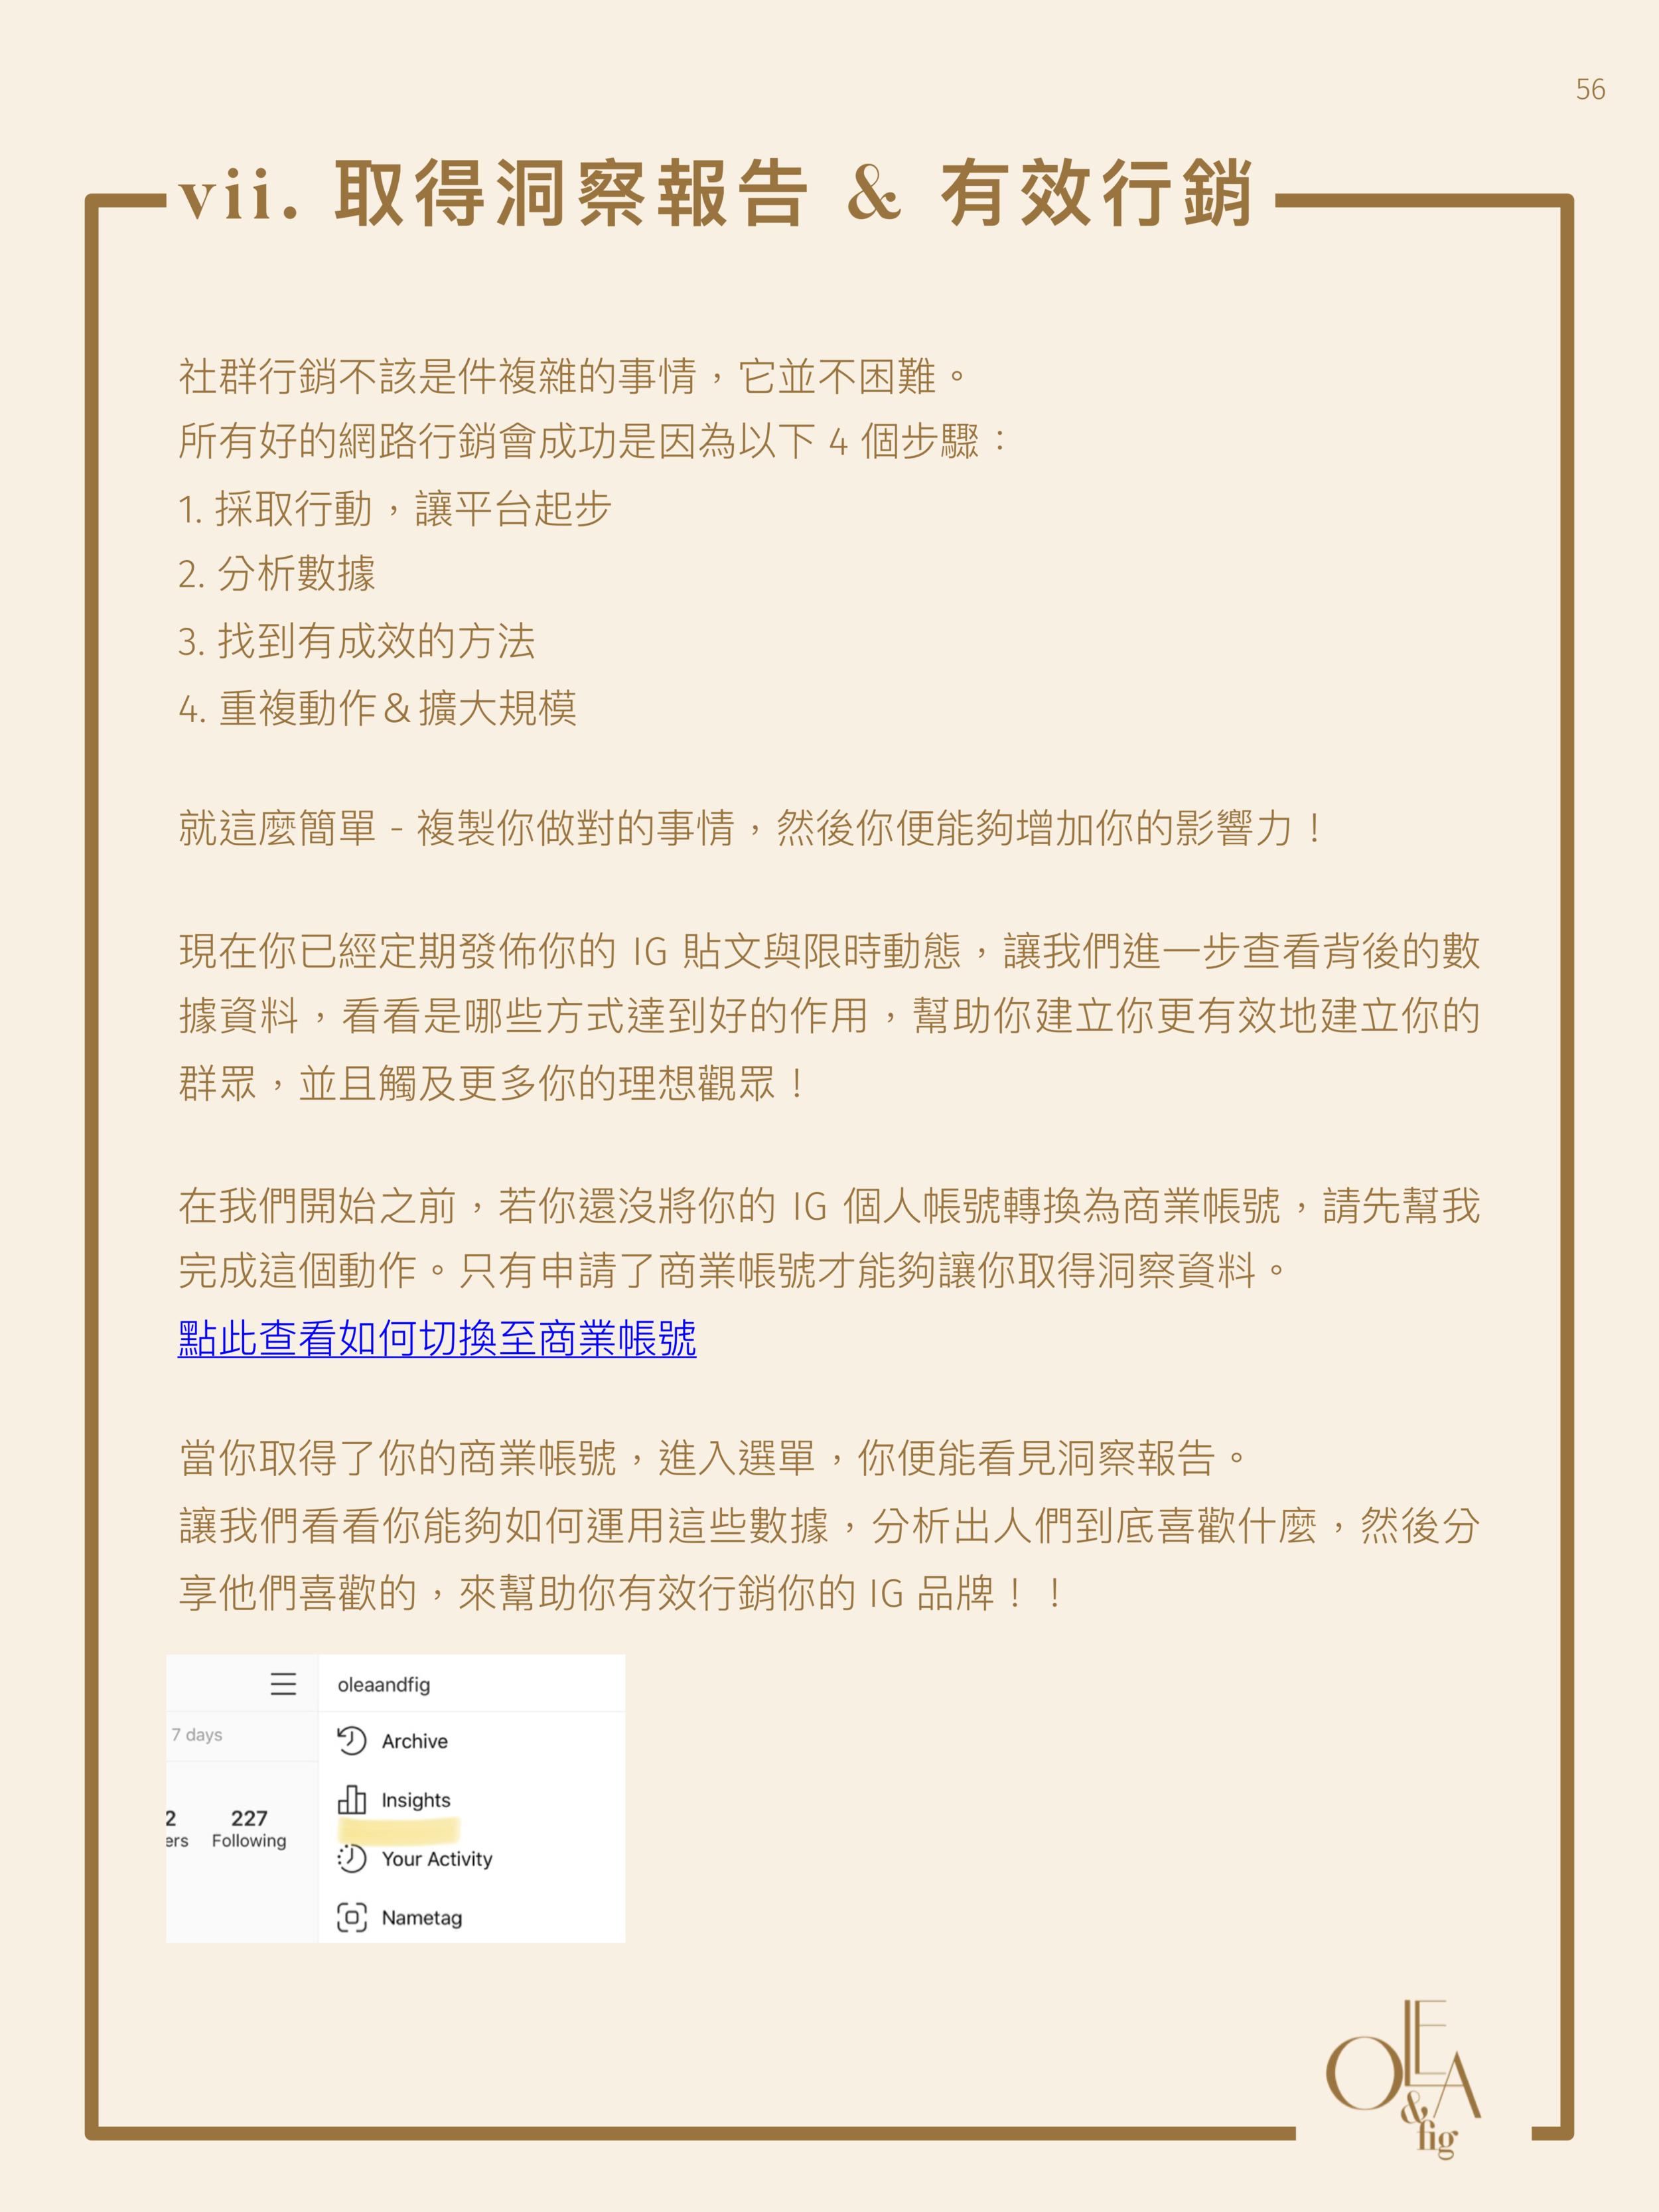 [Olea & FIg] IG終極指南手冊.png